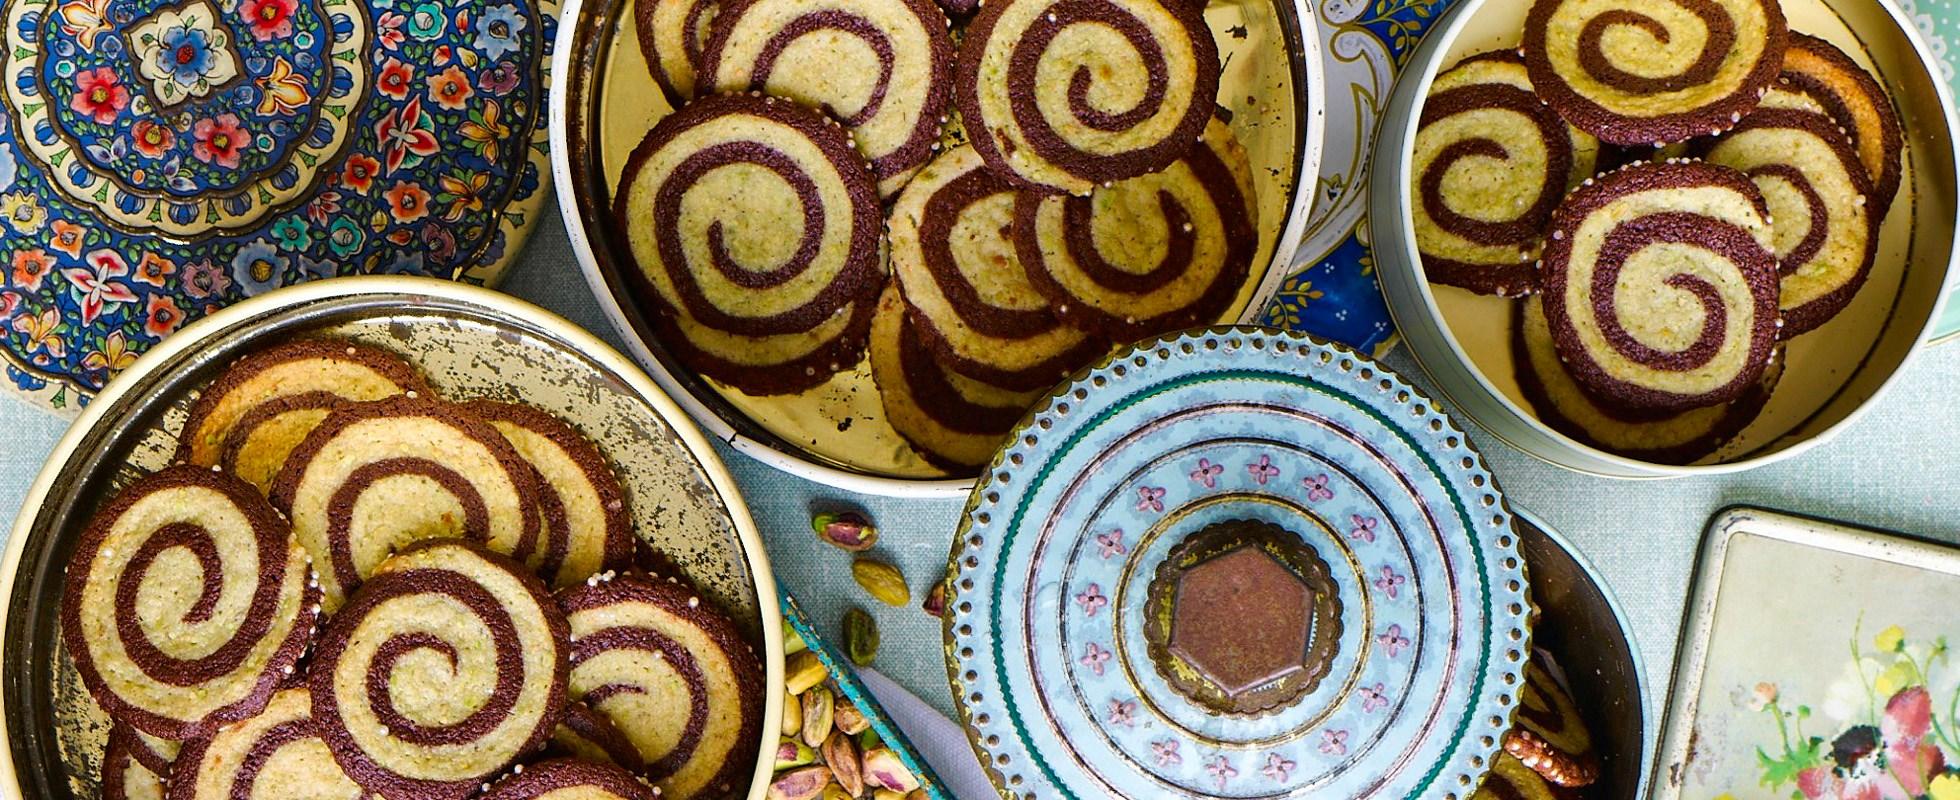 Pistachio swirl biscuits